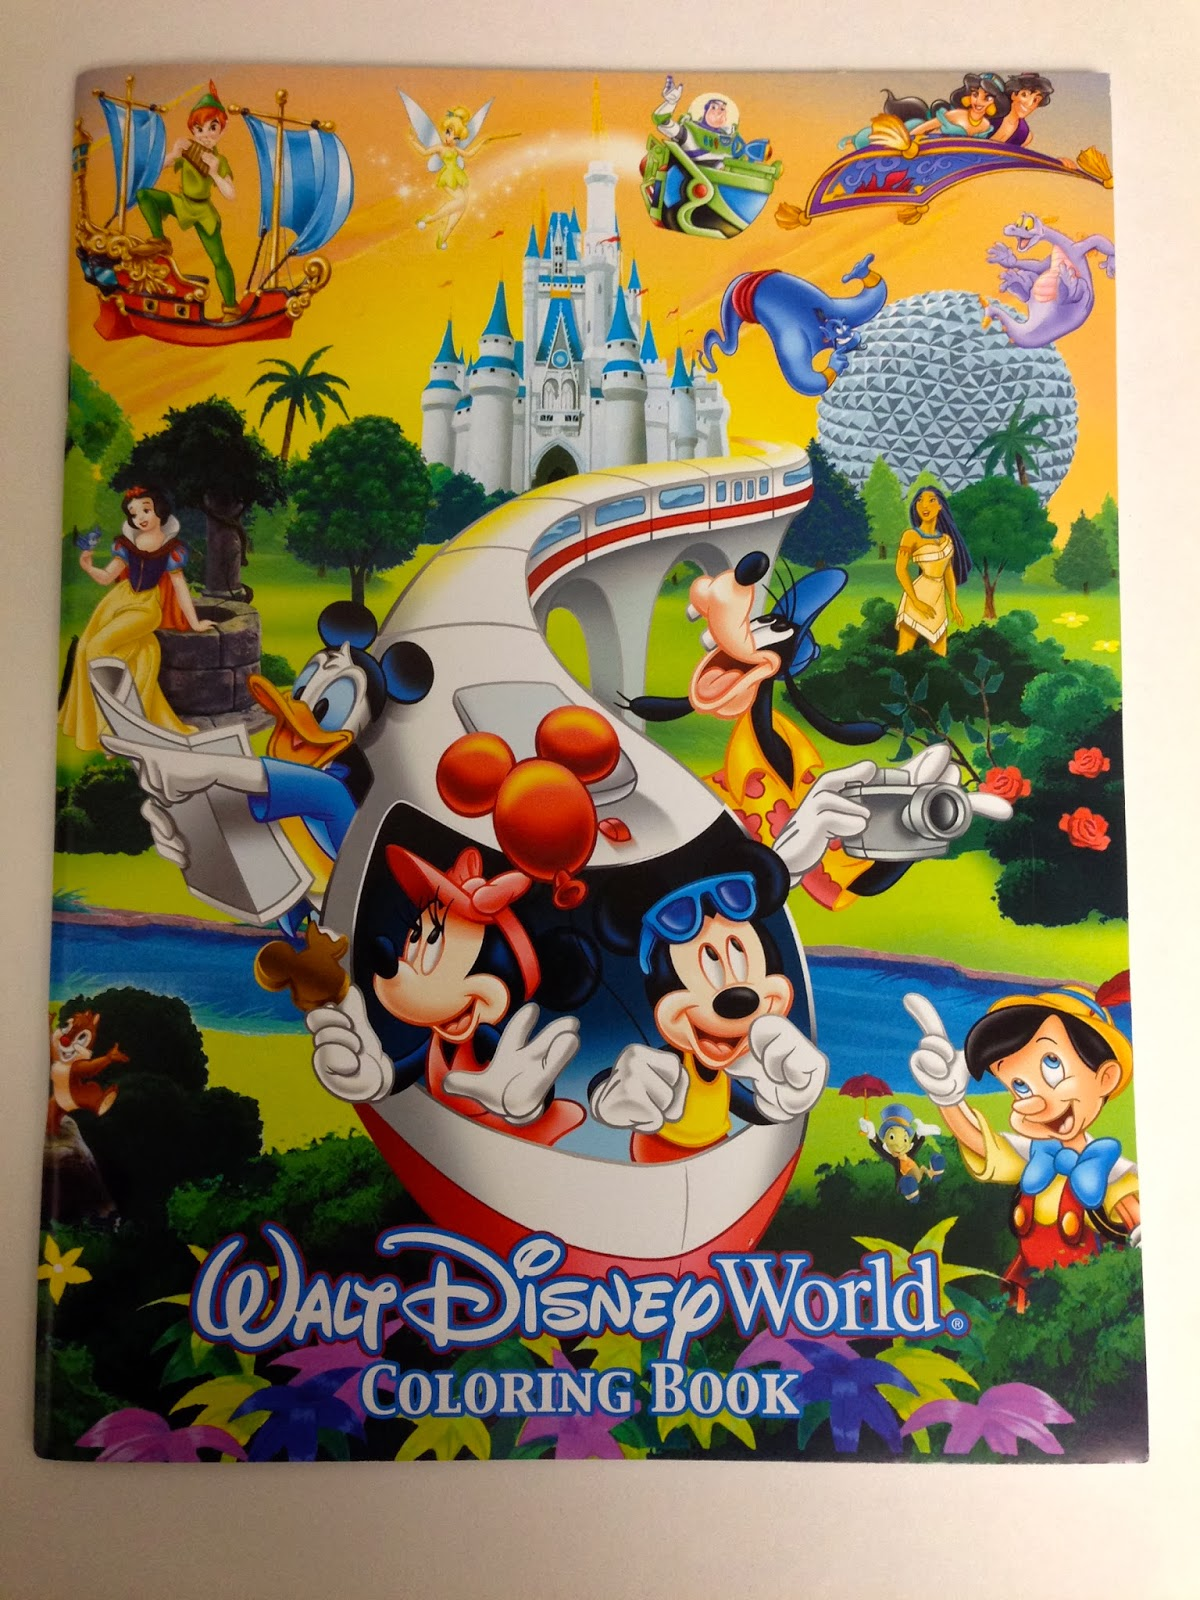 A Walt Disney World Coloring Book